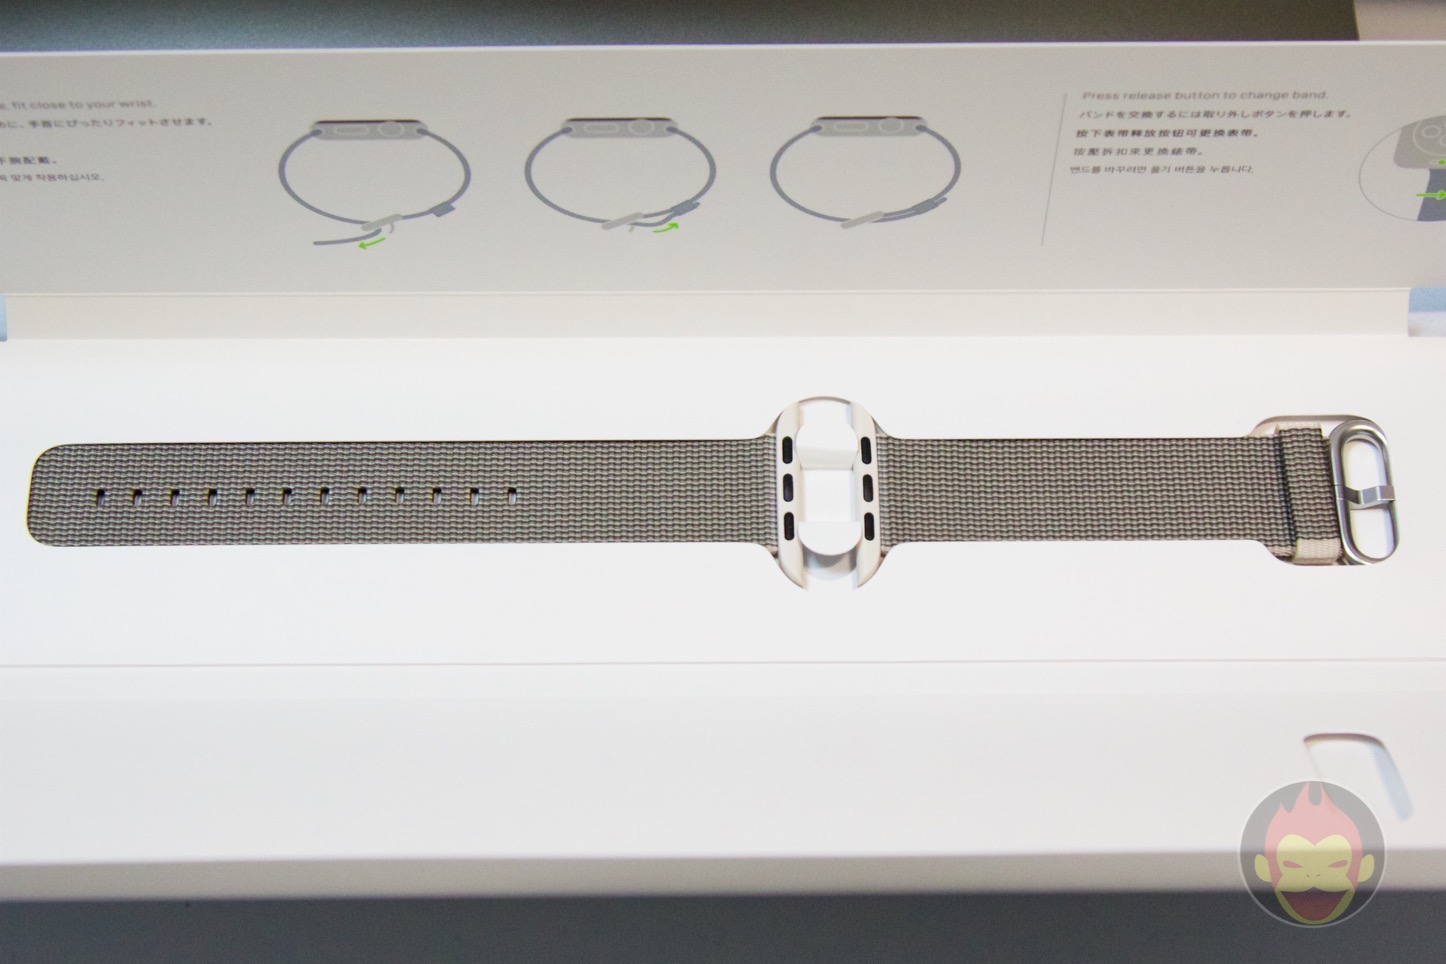 Apple-Watch-Woven-Nylon-Band-02.jpg